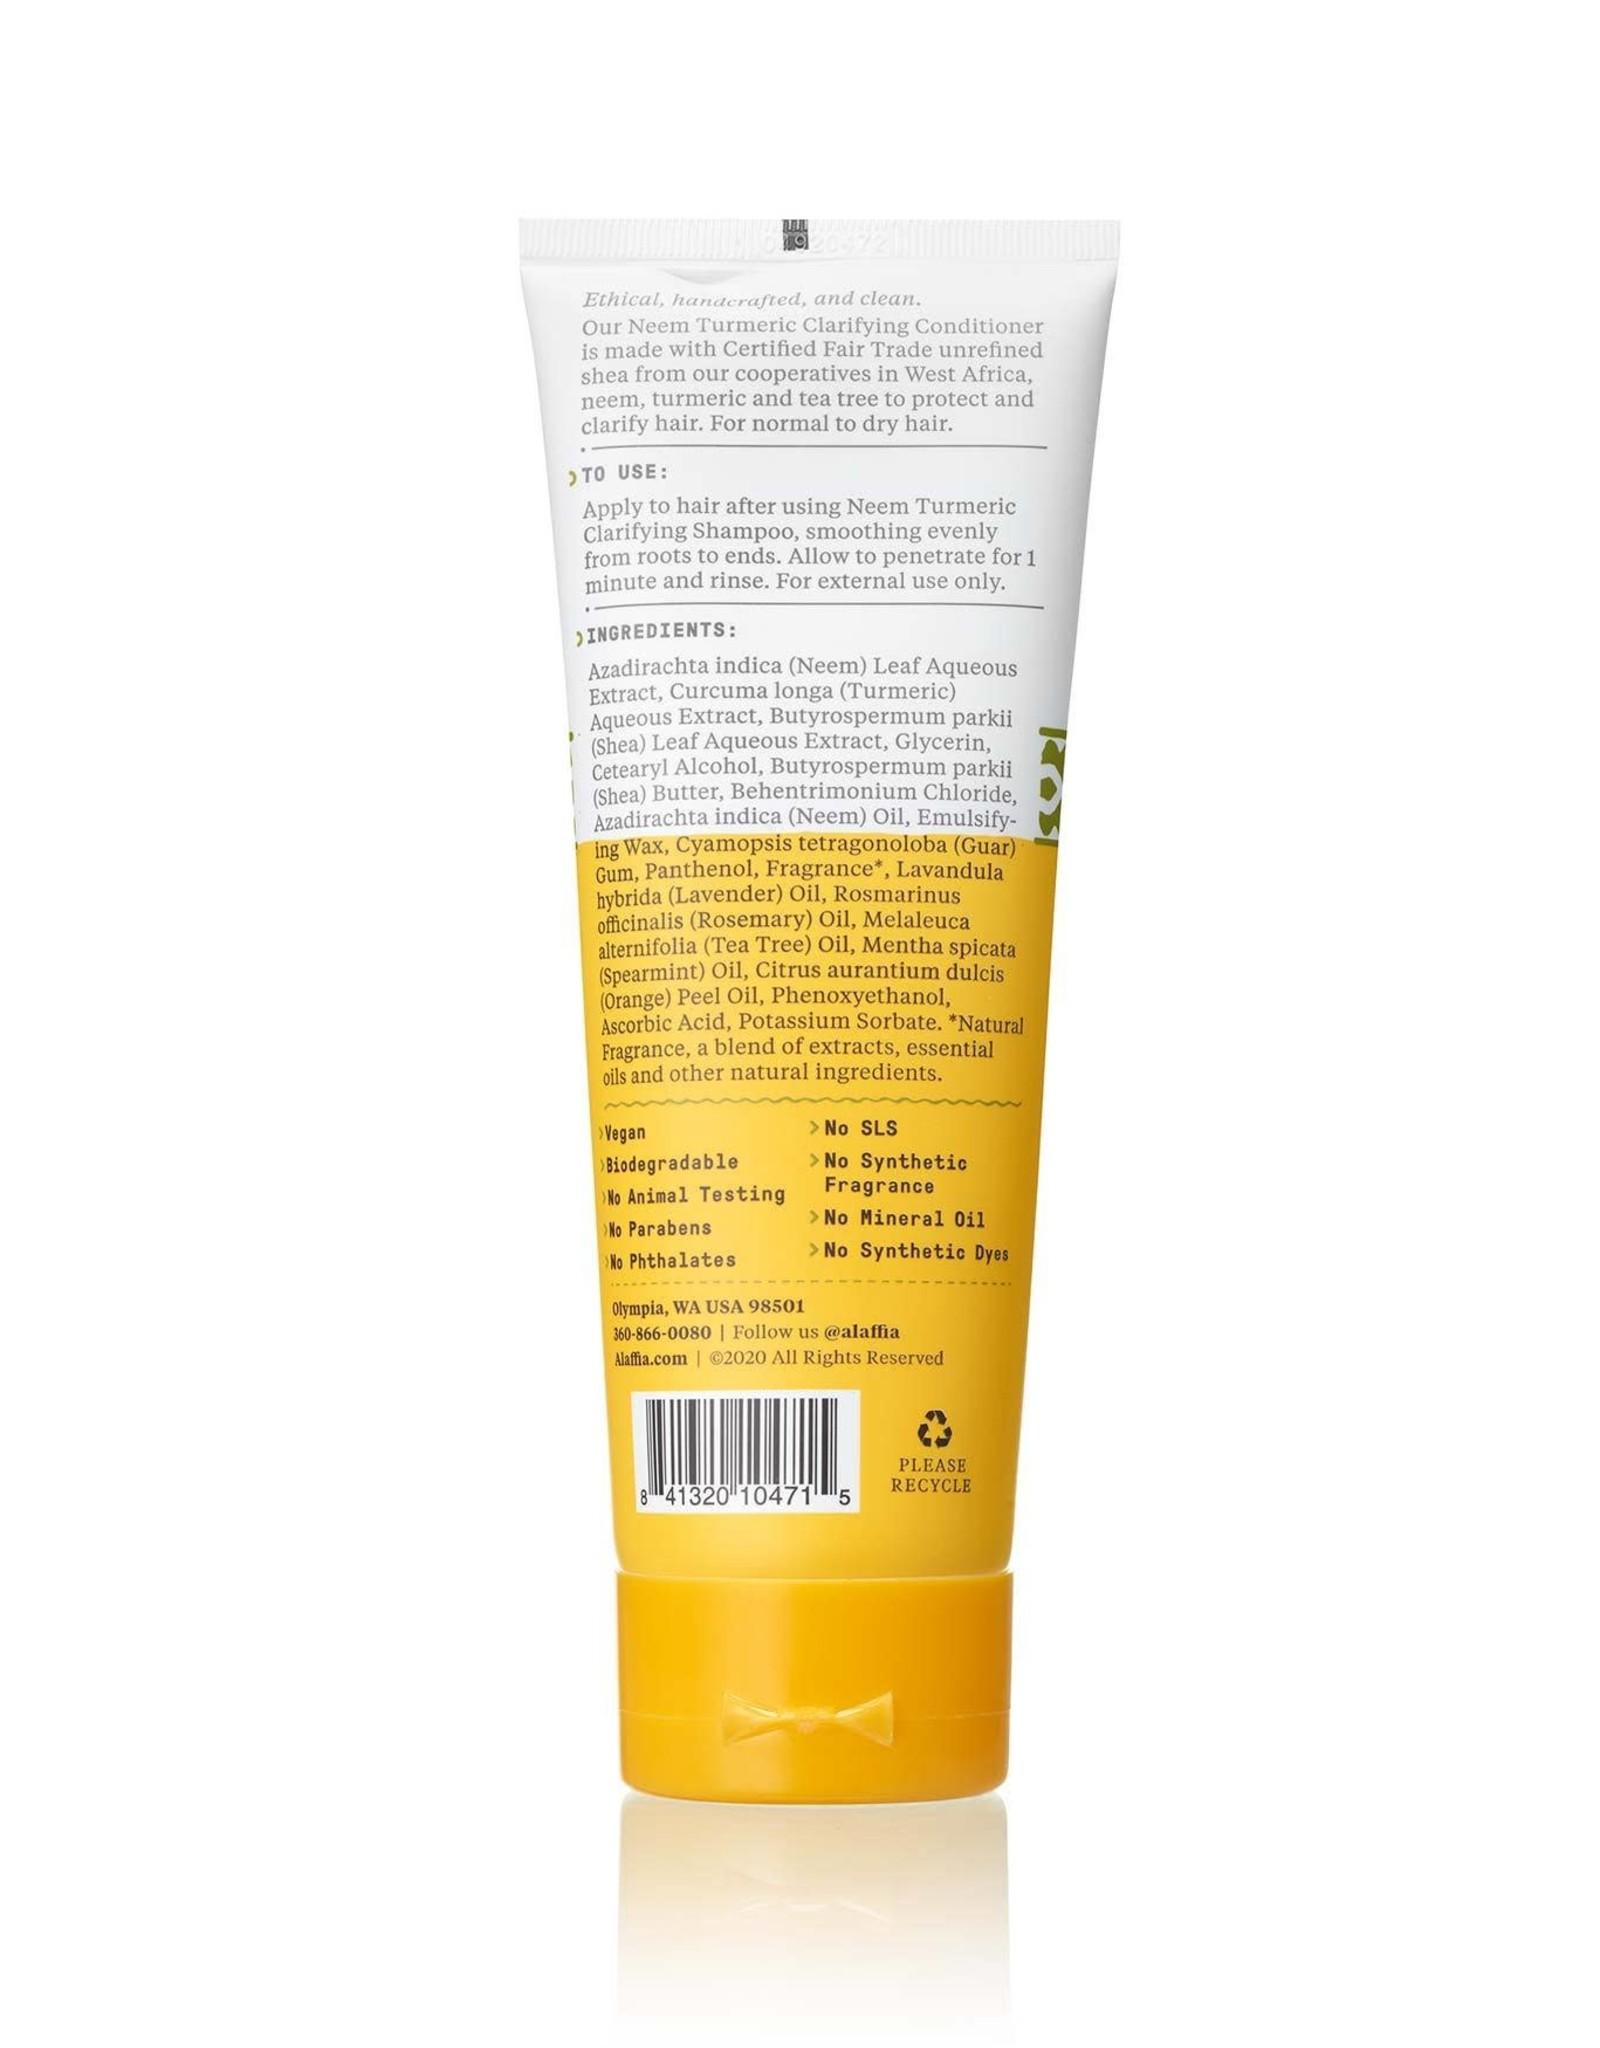 Alaffia Neem Turmeric Clarifying Shampoo, Natural Mint